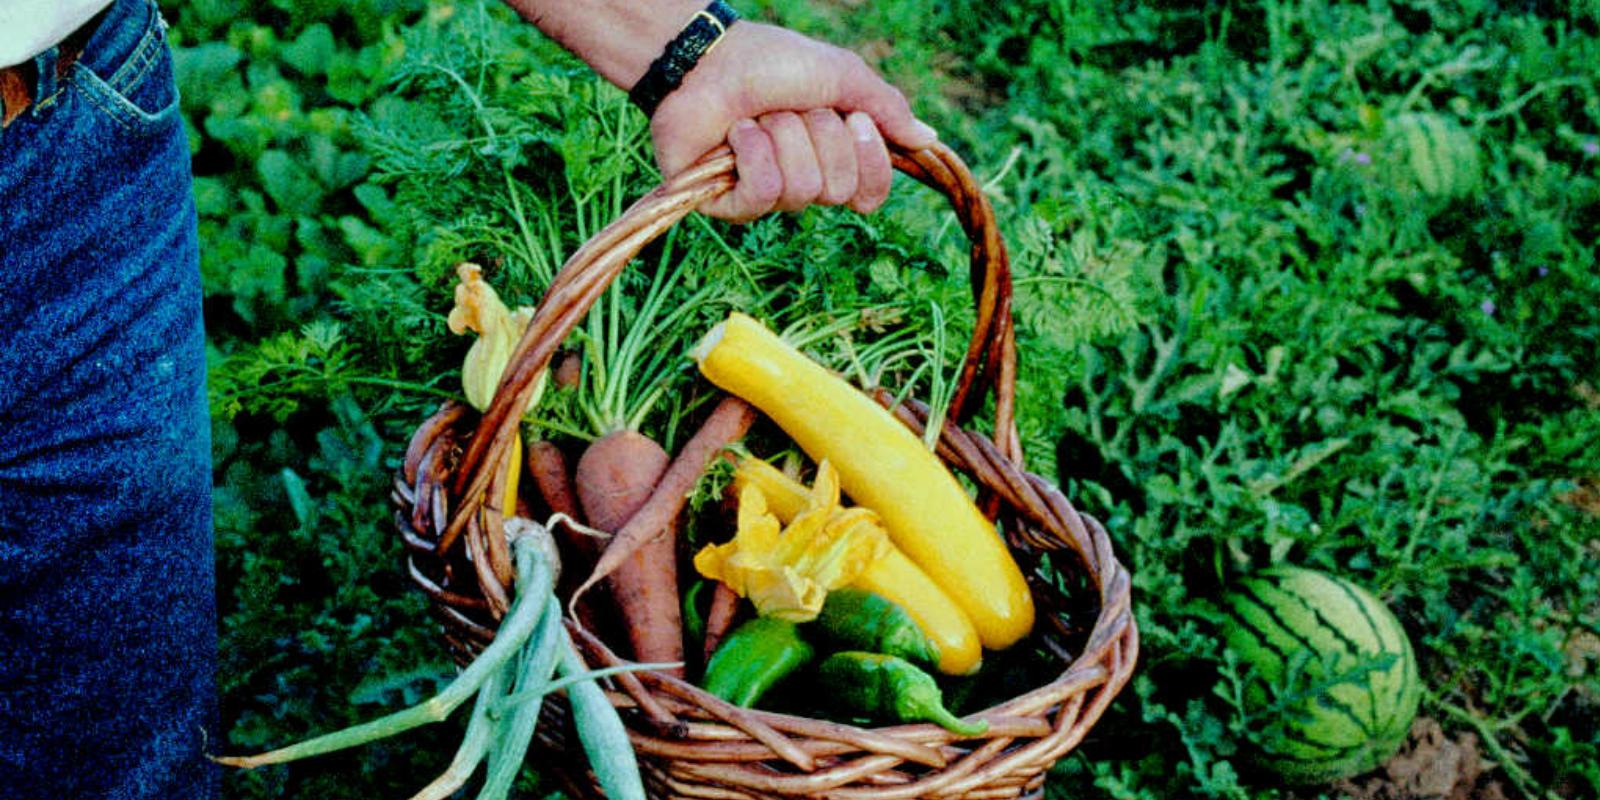 Grow Your Own Organic Garden (Damariscotta)